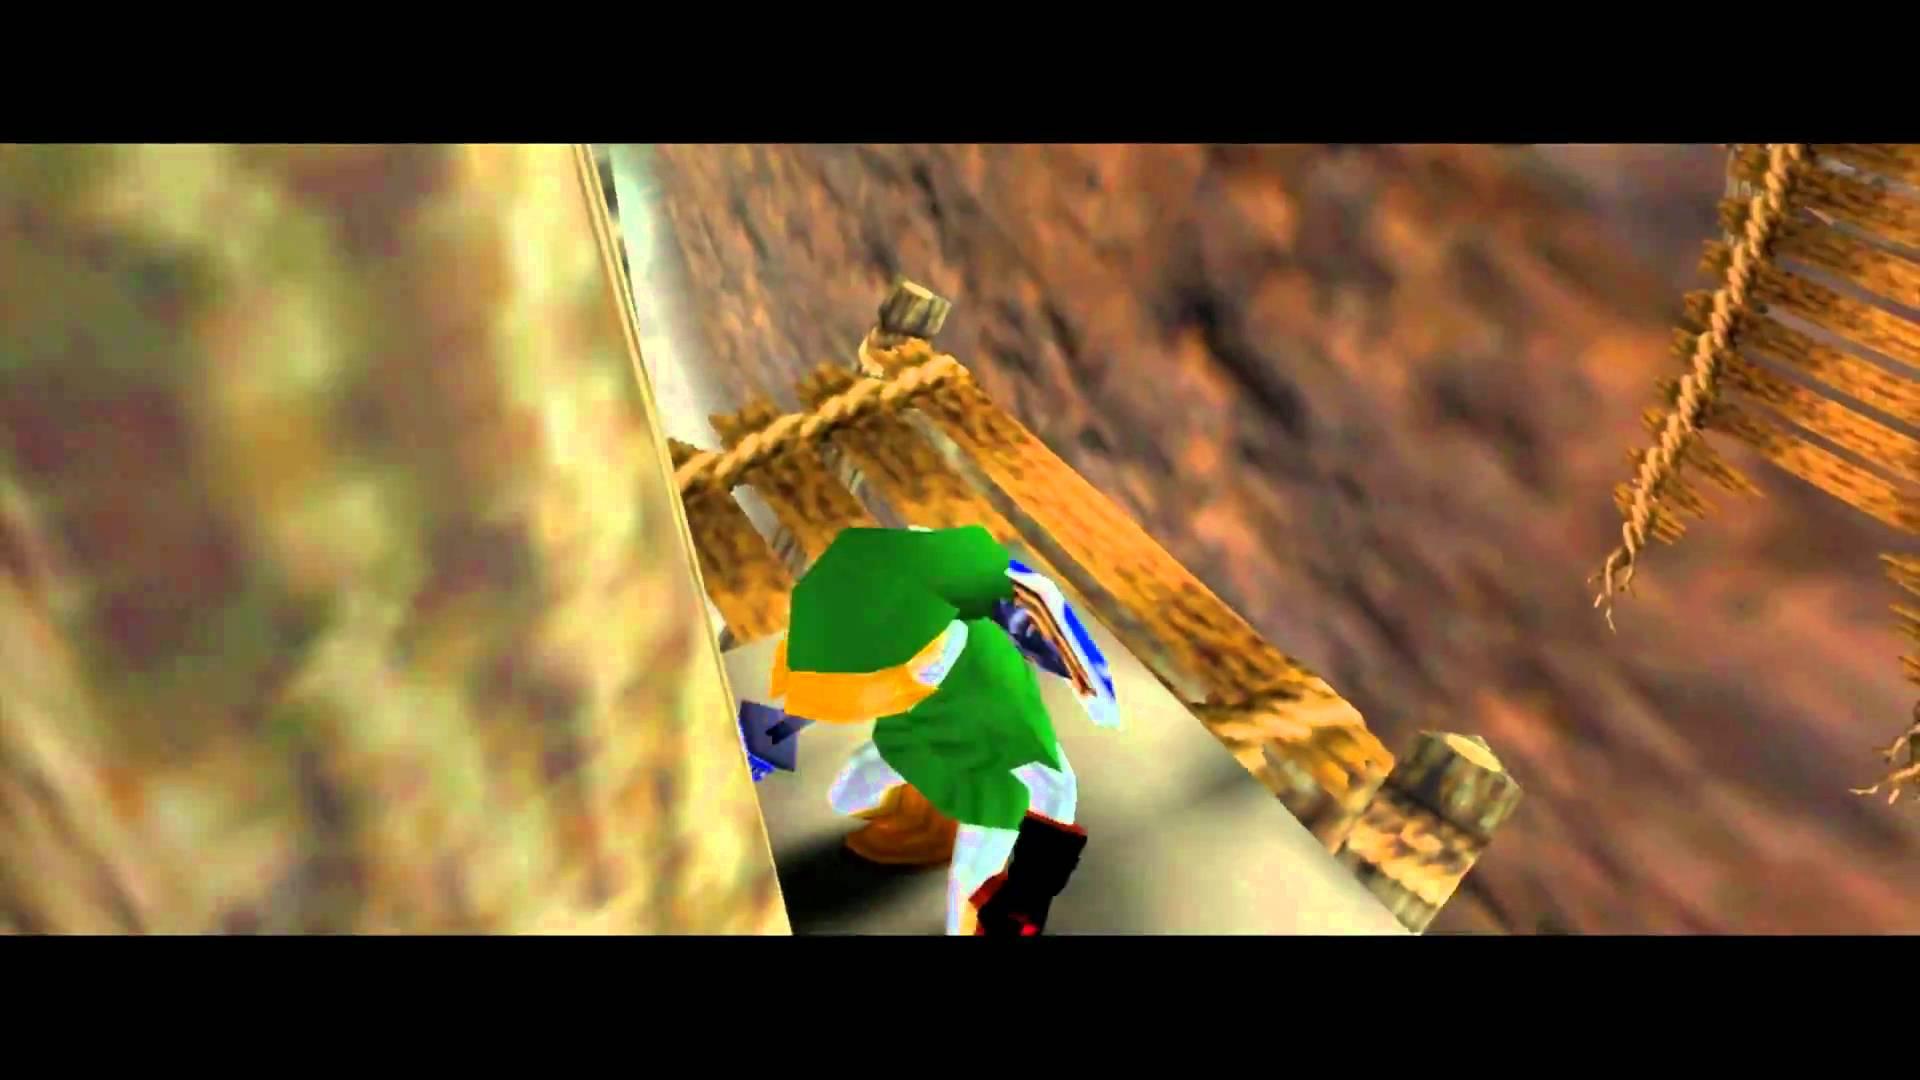 Ocarina of Time salió al mercado el 21 de noviembre de 1998.